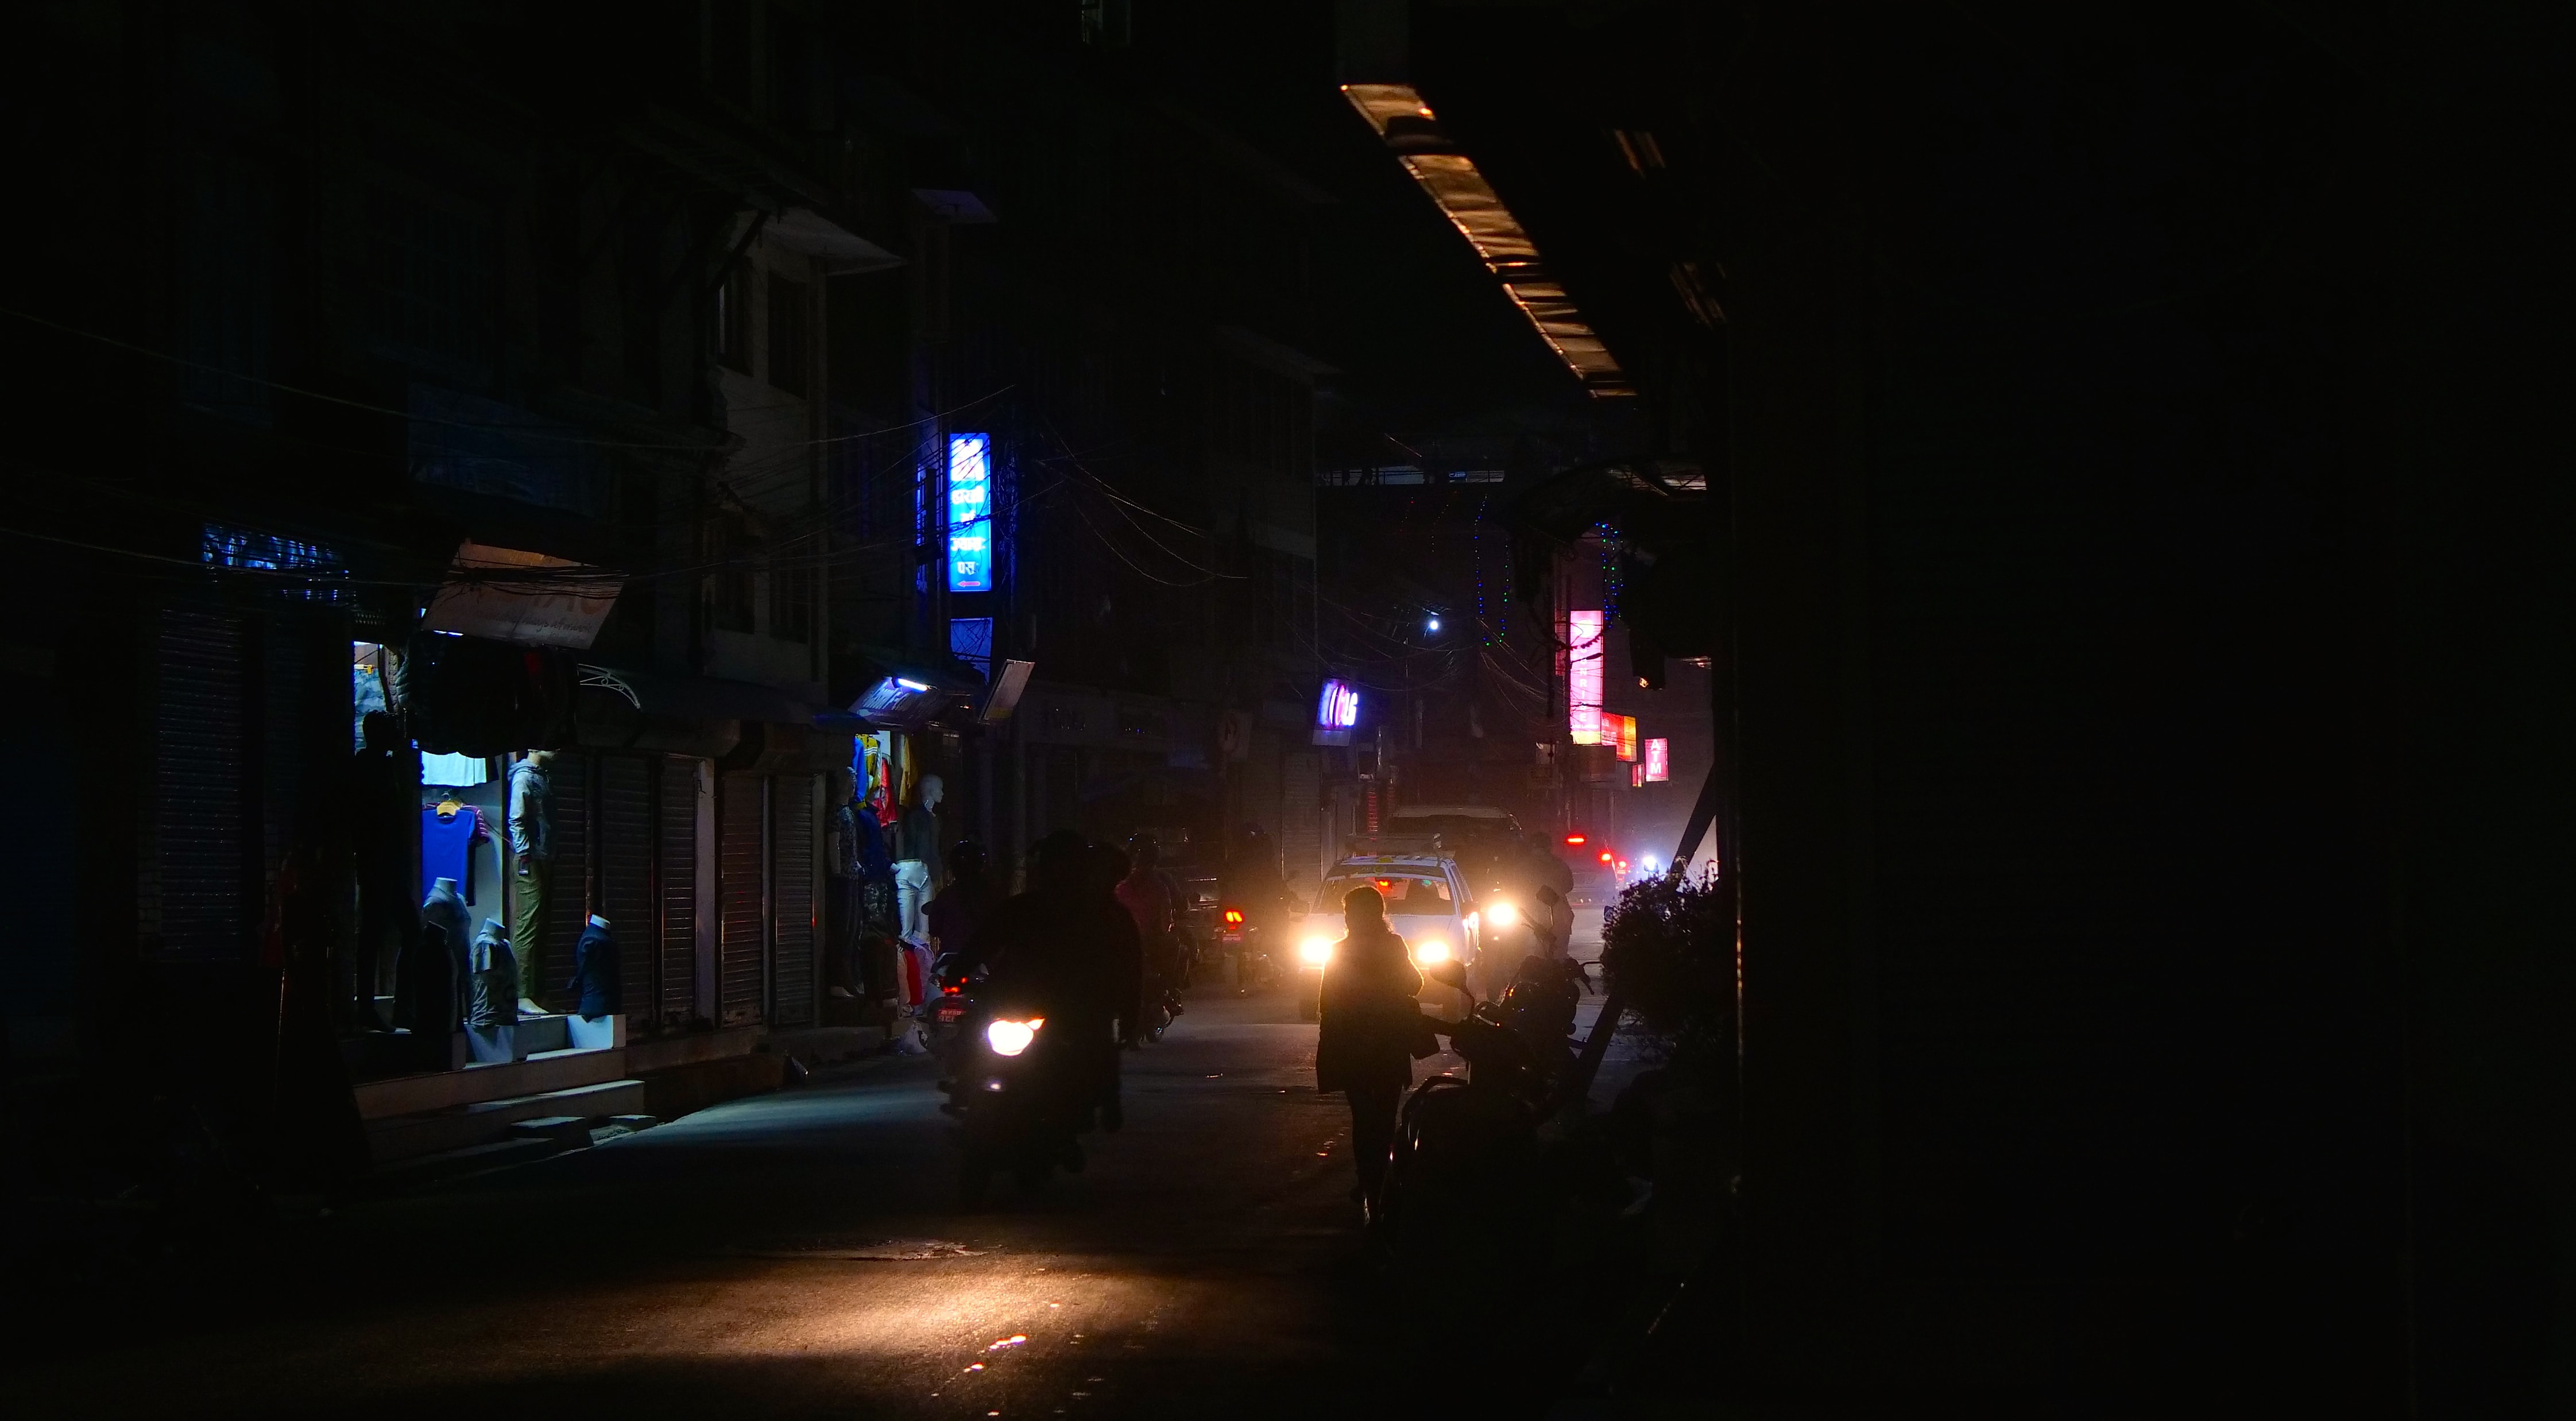 Field Recording nepal himalaya David kamp studiokamp city wide night